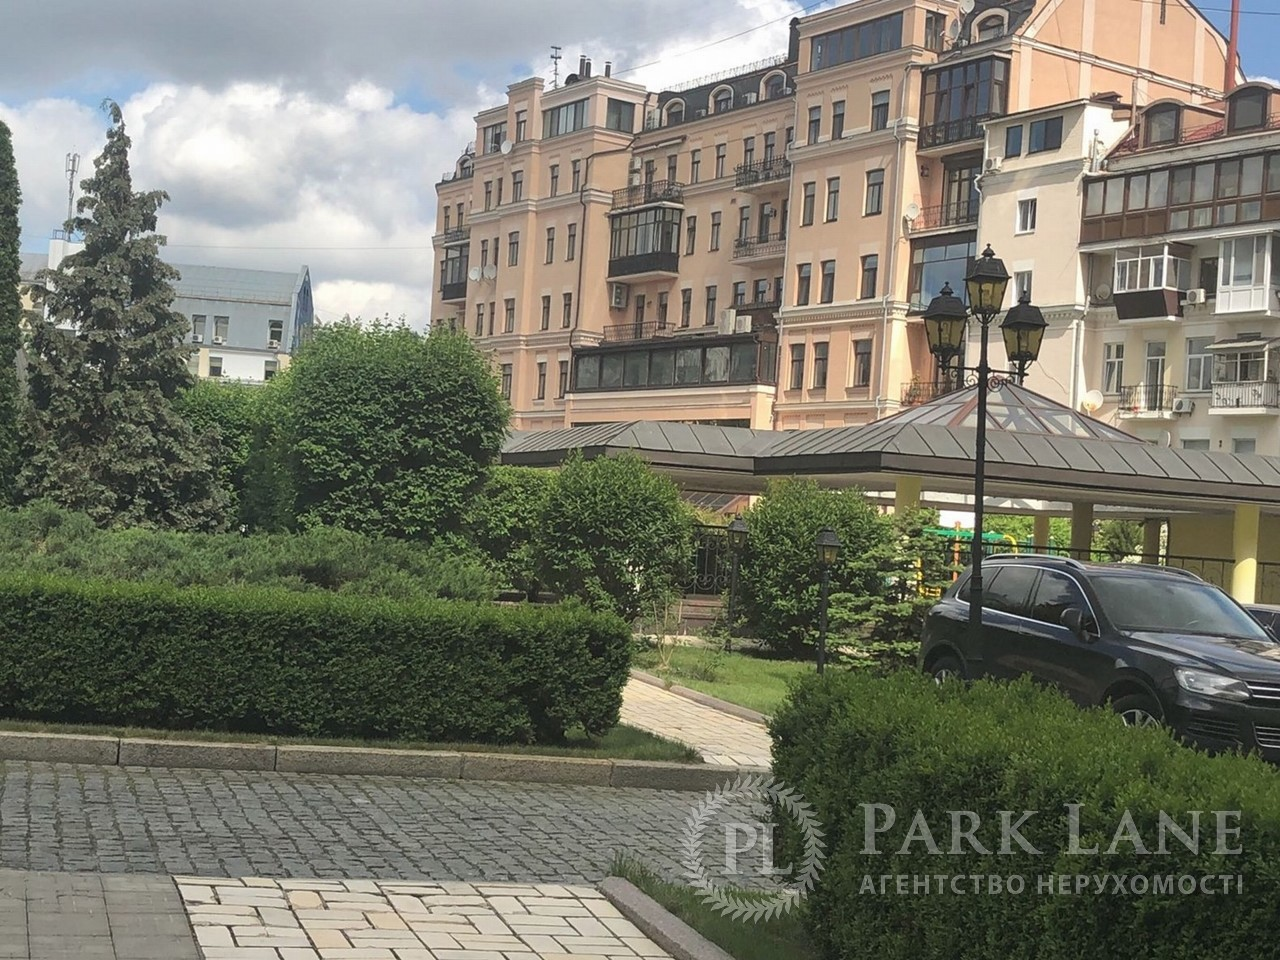 Квартира ул. Владимирская, 21/20, Киев, Z-341877 - Фото 25